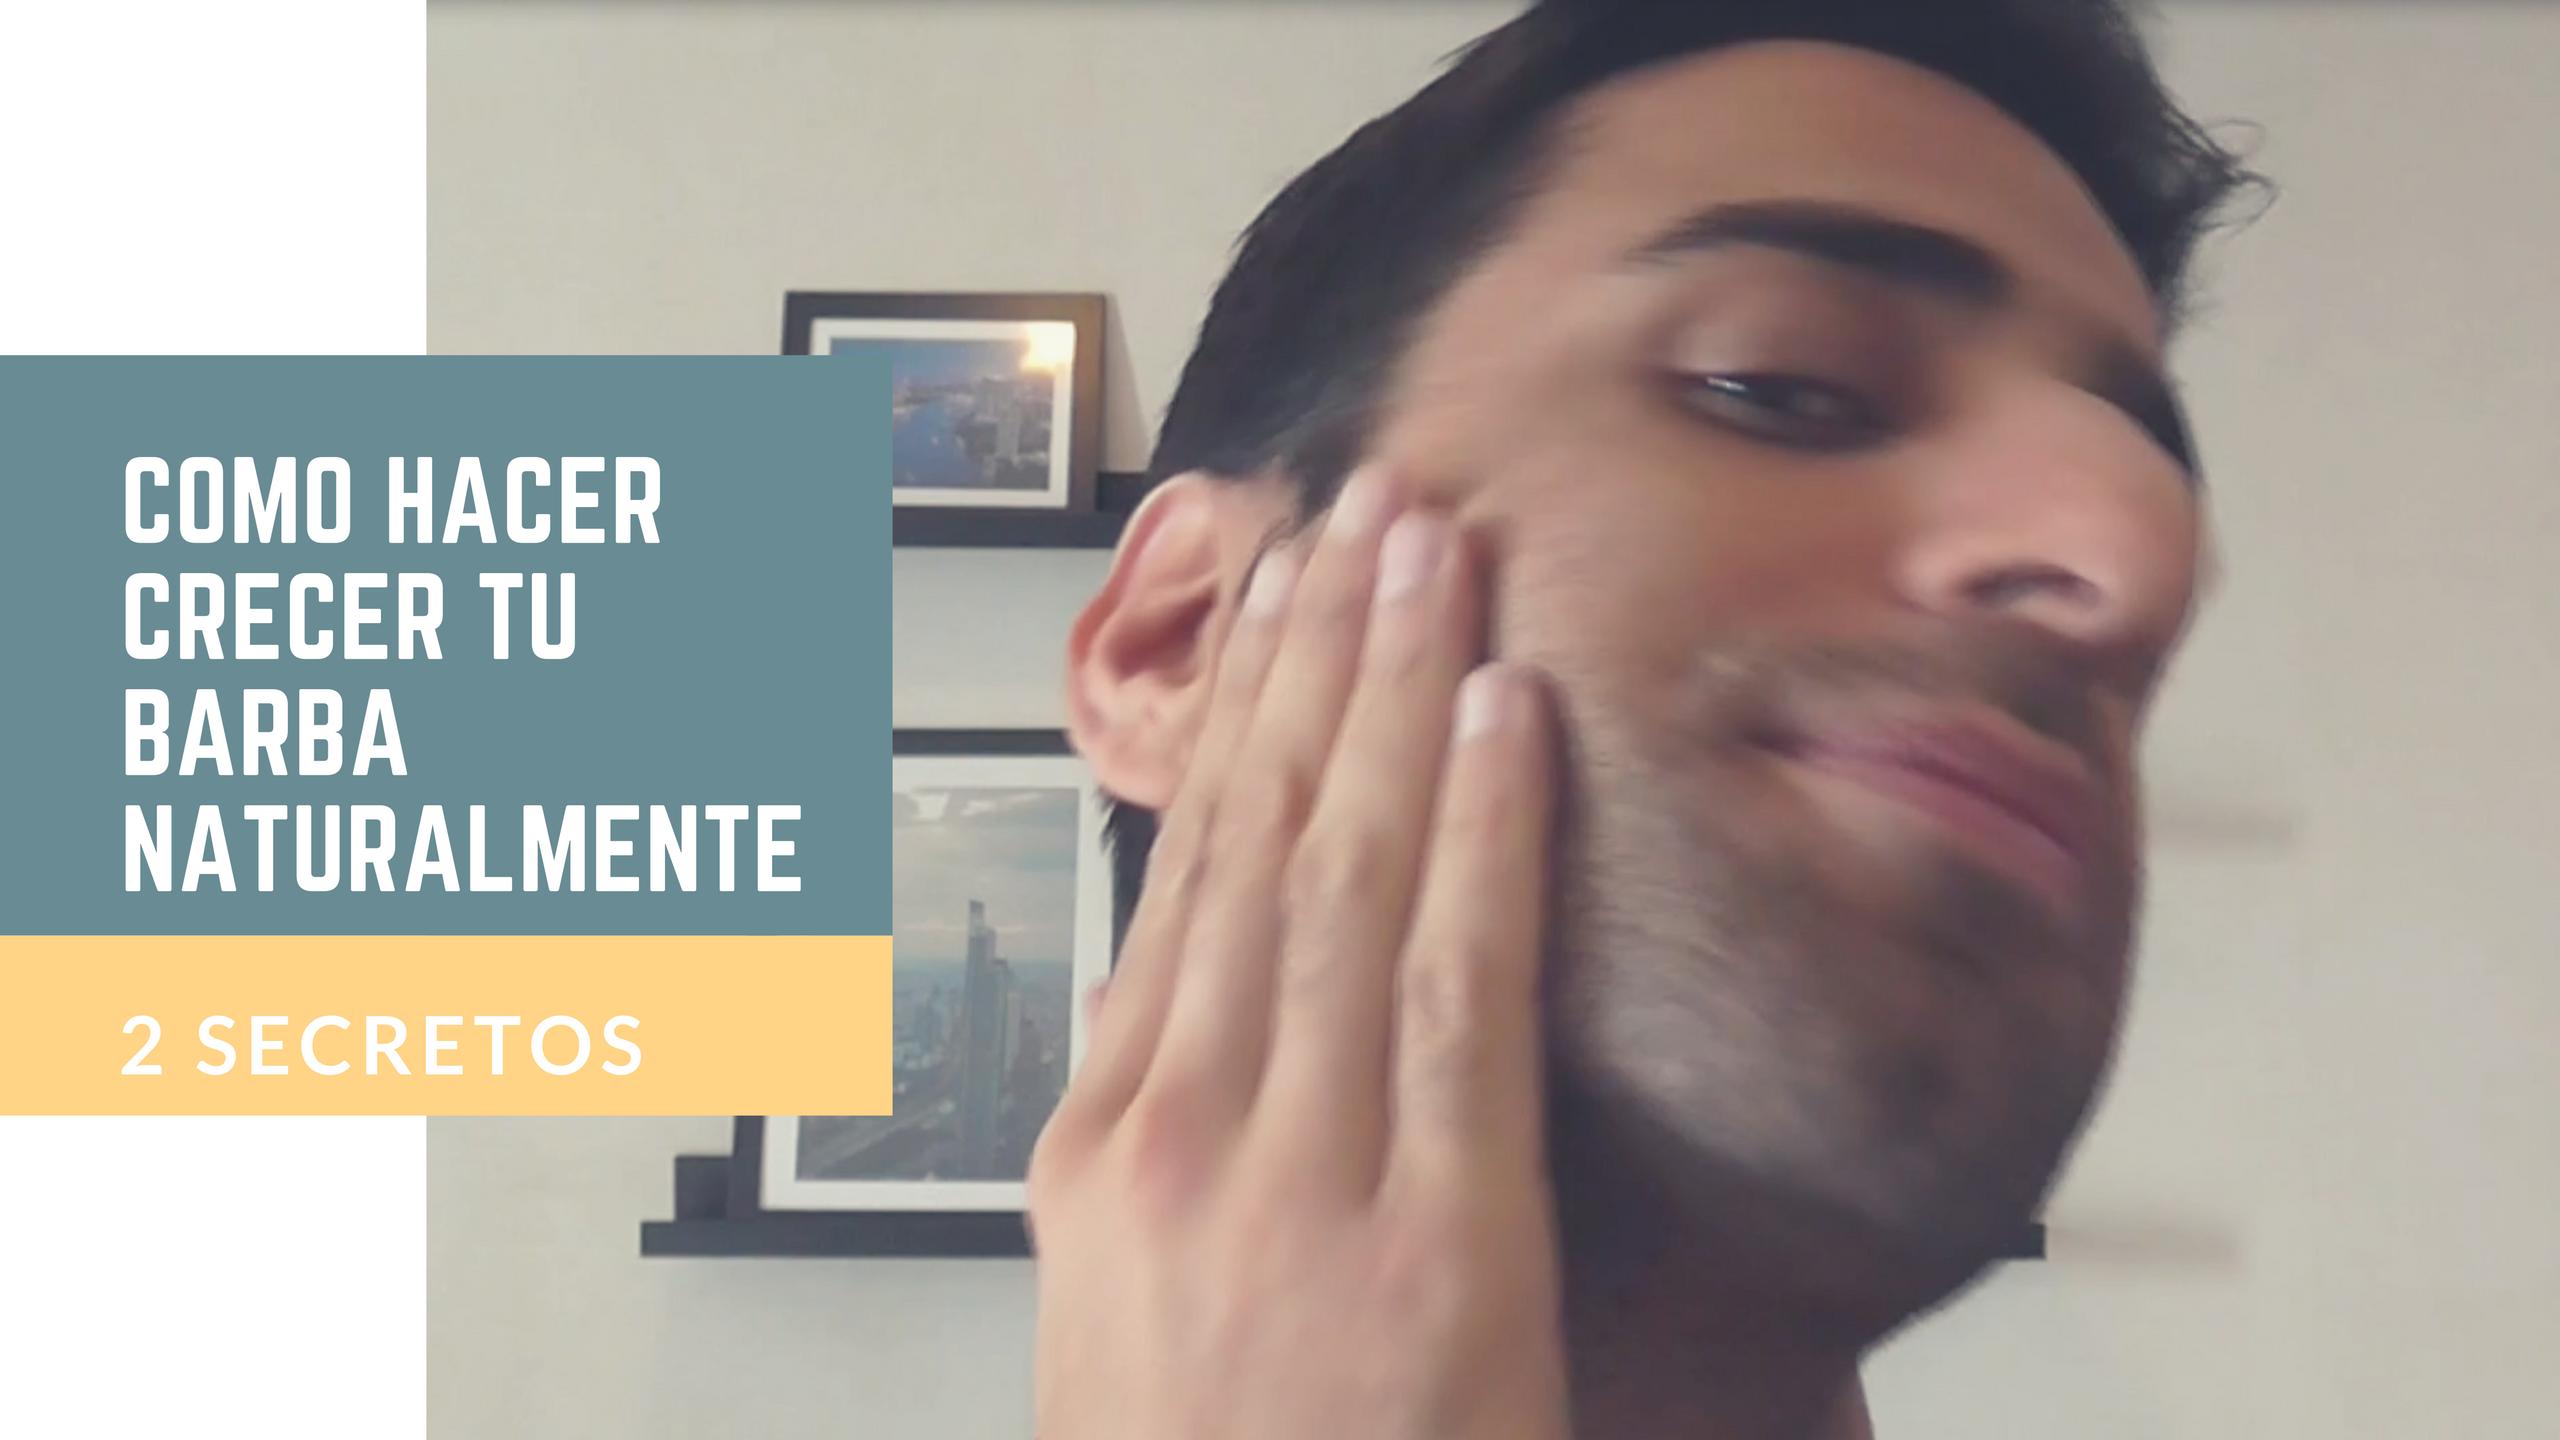 2 Trucos Para Hacer Crecer Tu Barba De Forma Natural